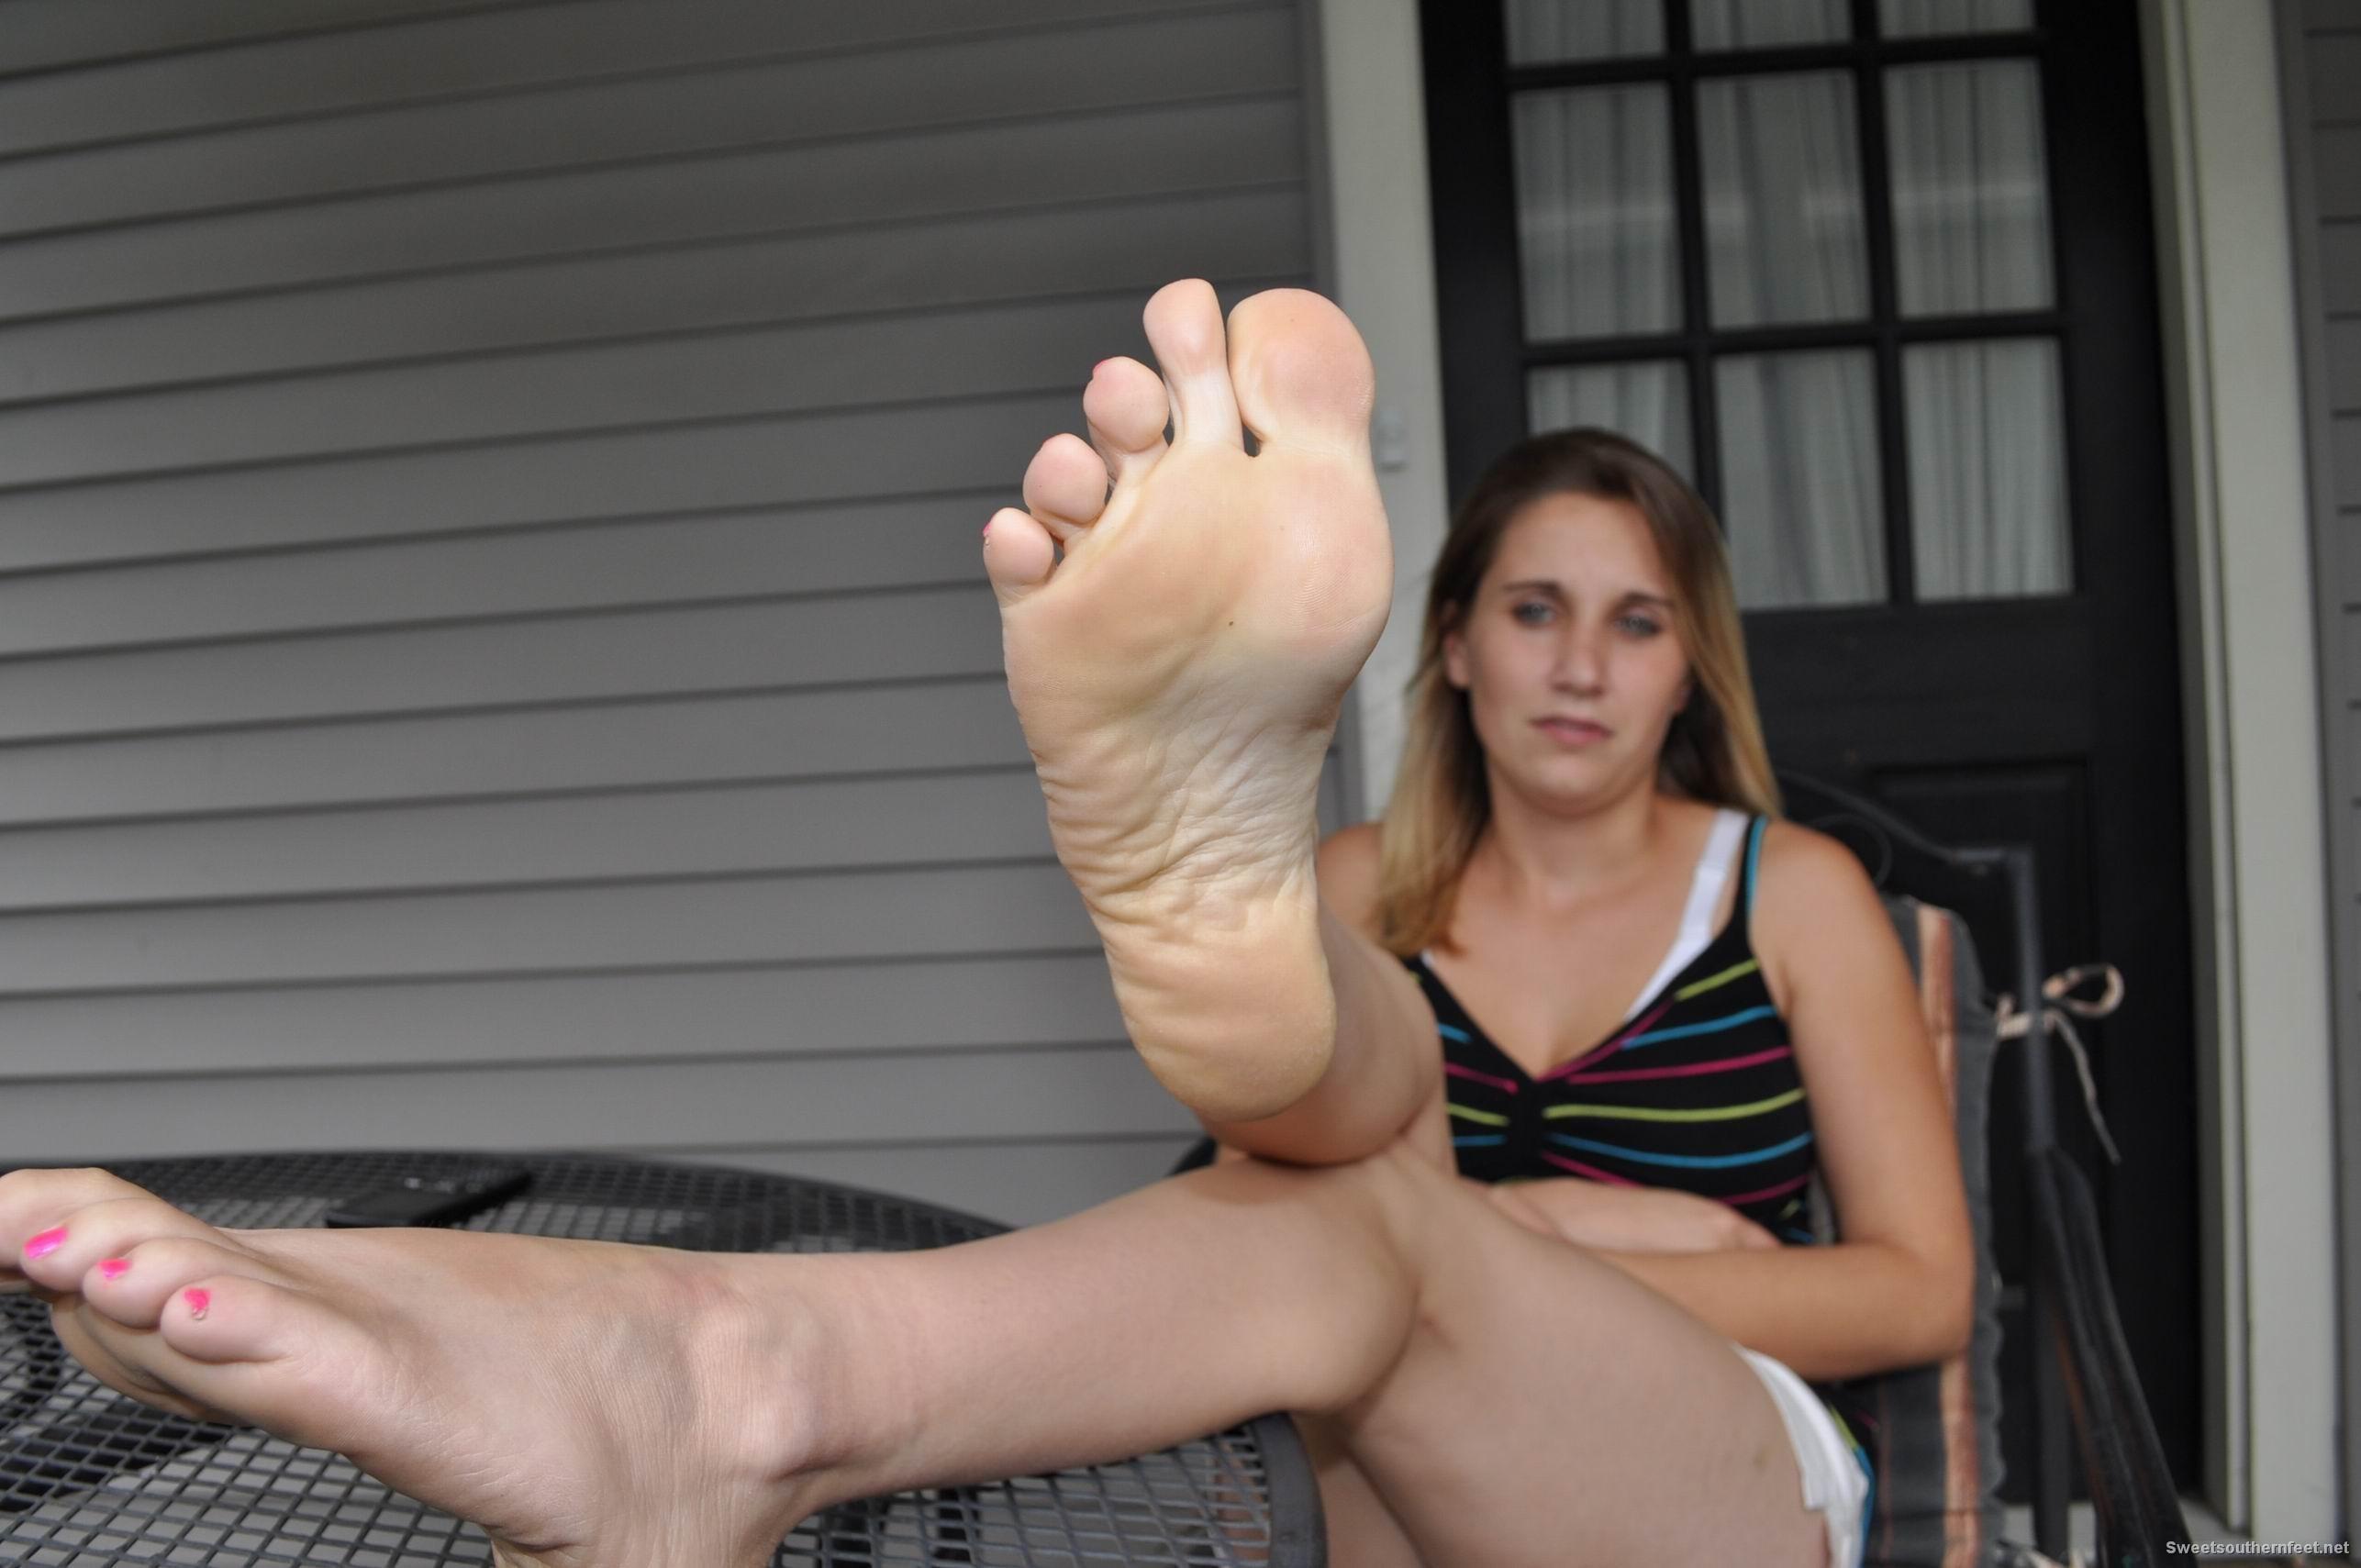 Сестра возбудила ножками брата футфетиш, Брат сестра фут фетиш - видео duration Sex Rolics HD 8 фотография